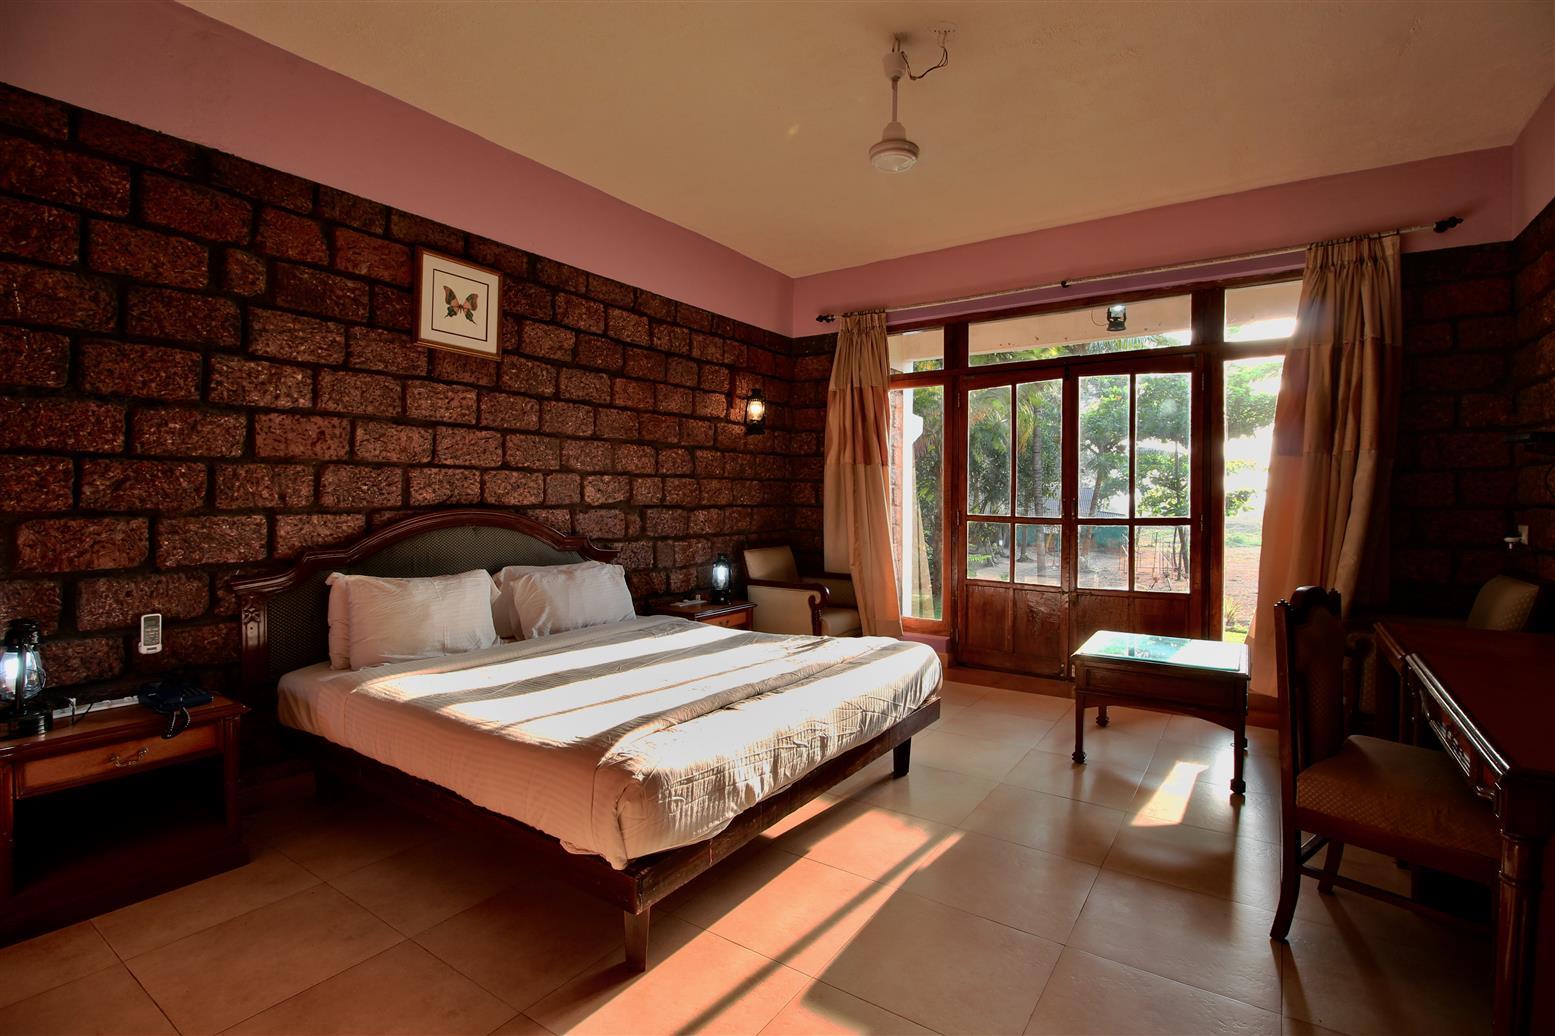 Choose Ecomantra Hospitality to Manage Your Eco Resorts